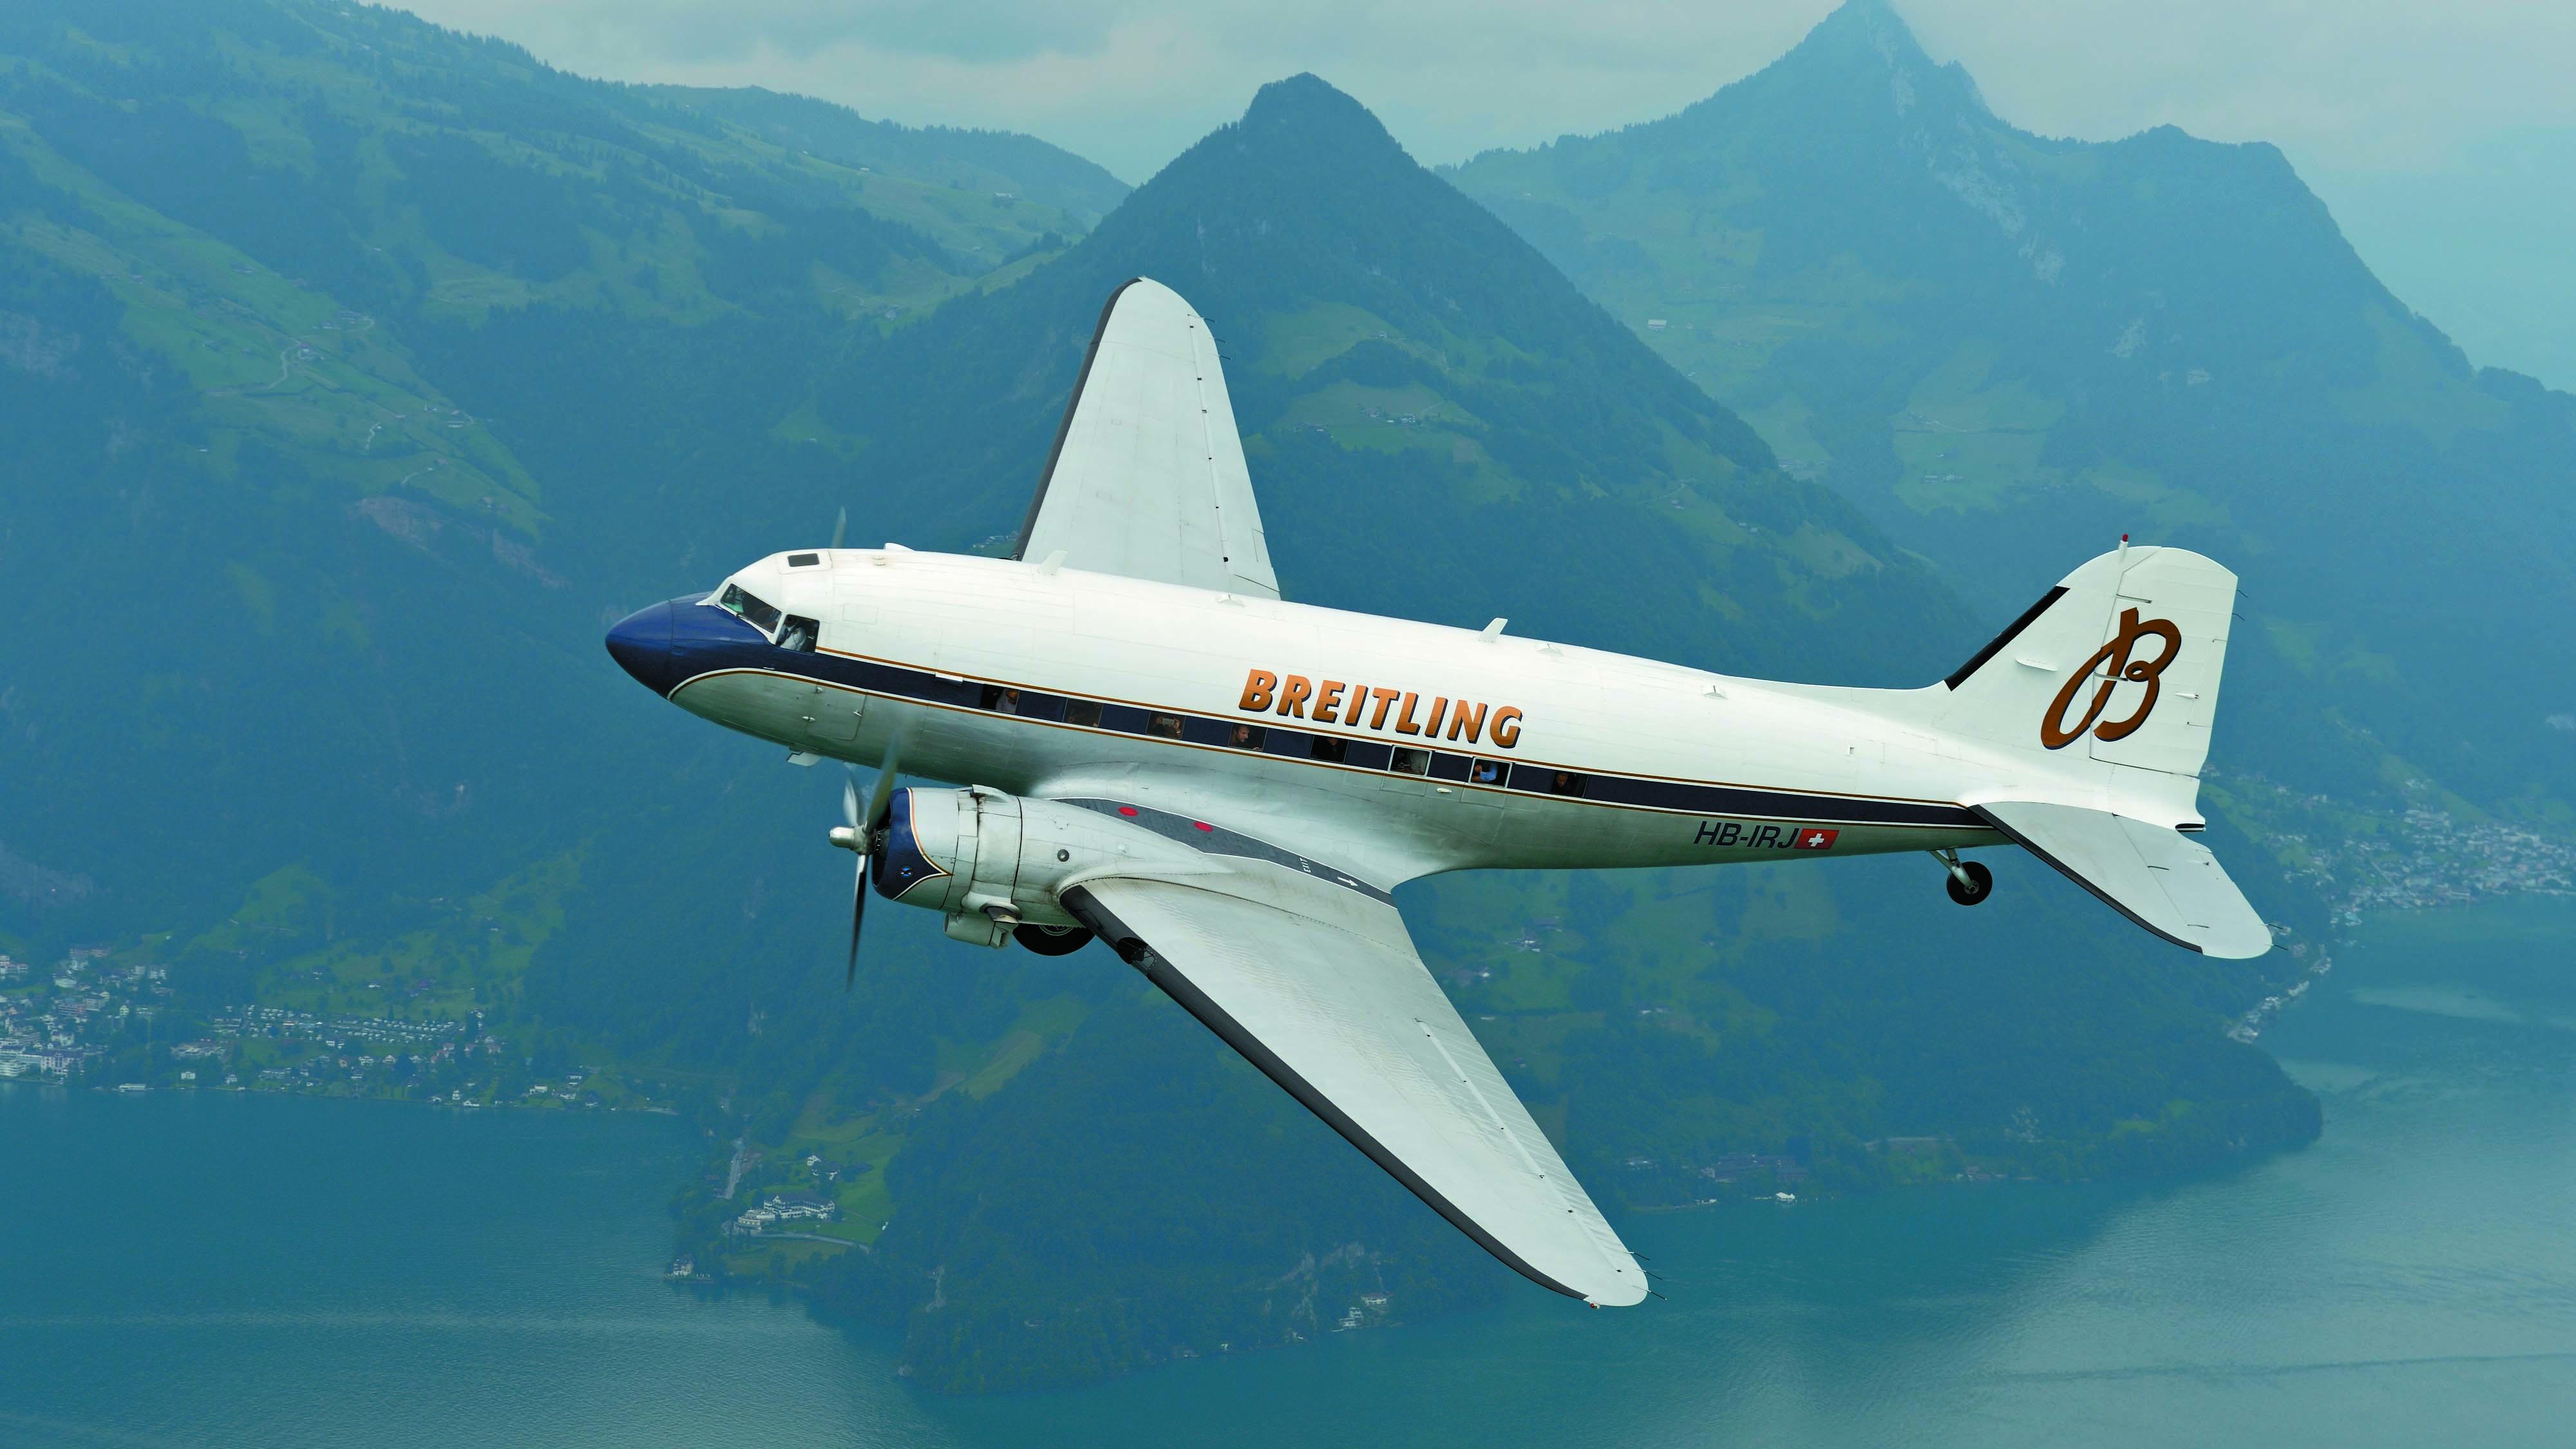 Breitling DC-3 Vintage airplane